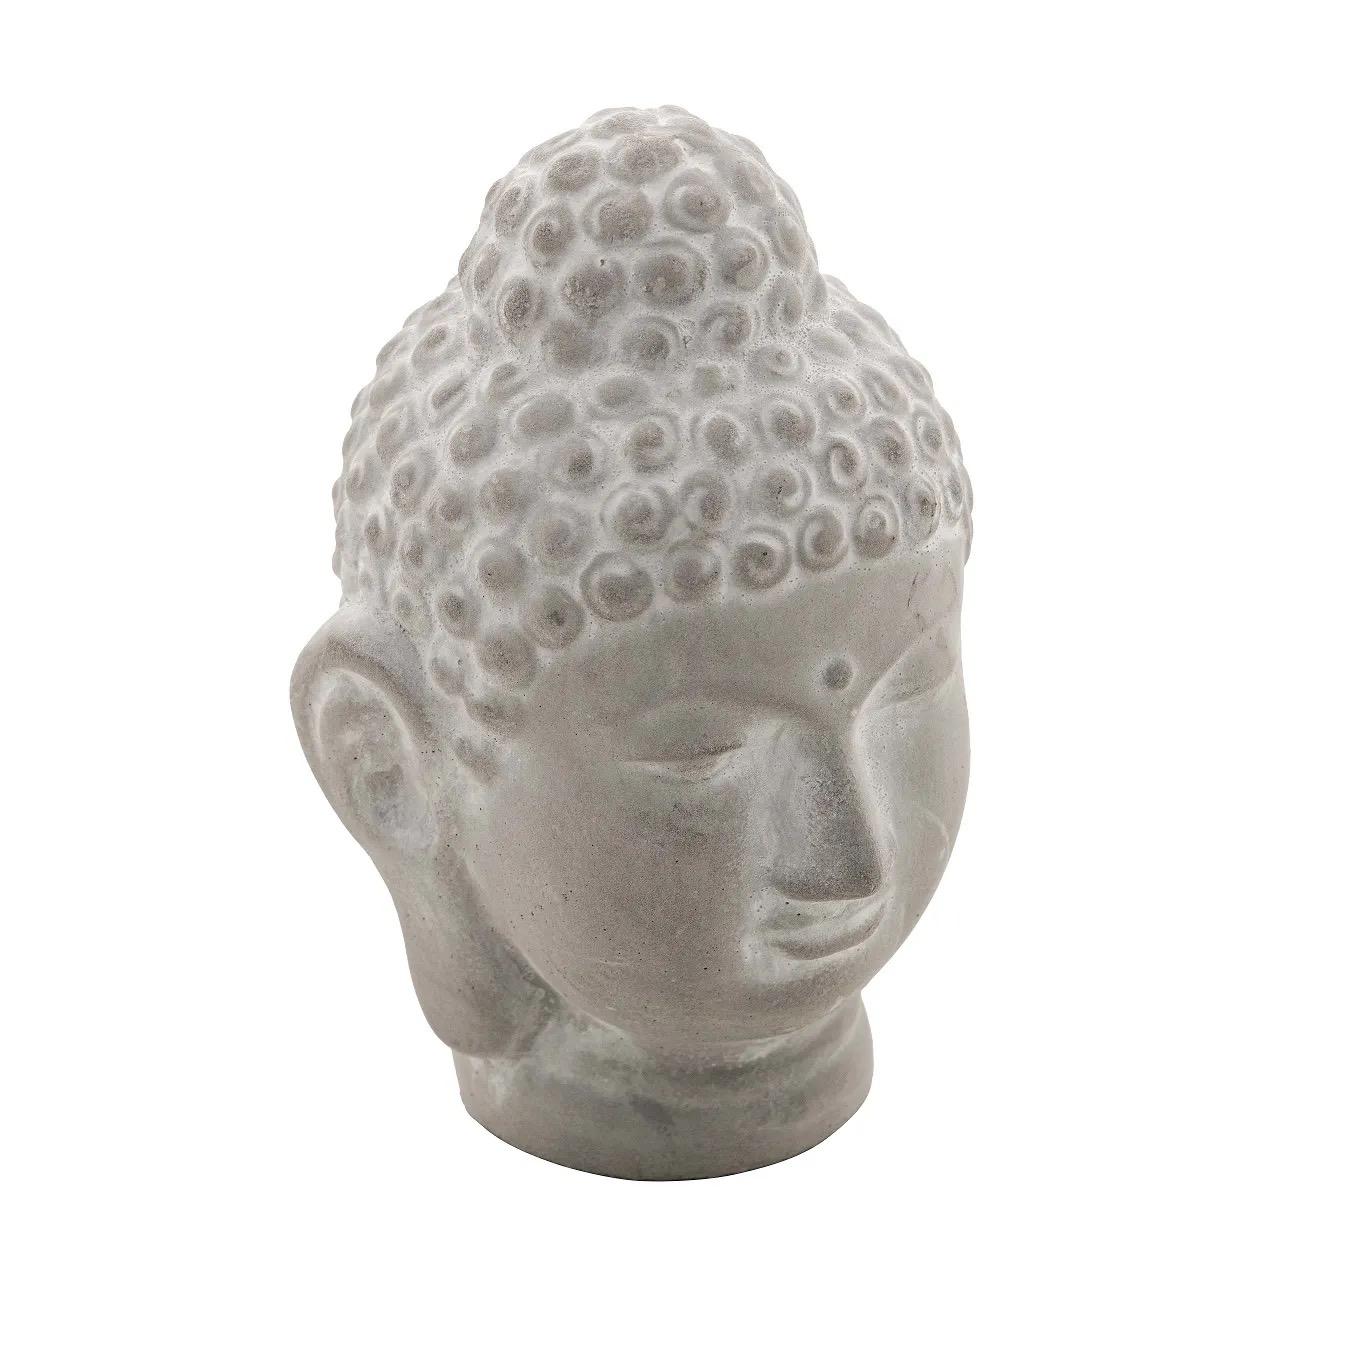 Buda Cabeça Hindu Namastê Tibetano Sidarta Concreto Cinza 8 x 8 x 12,5cm